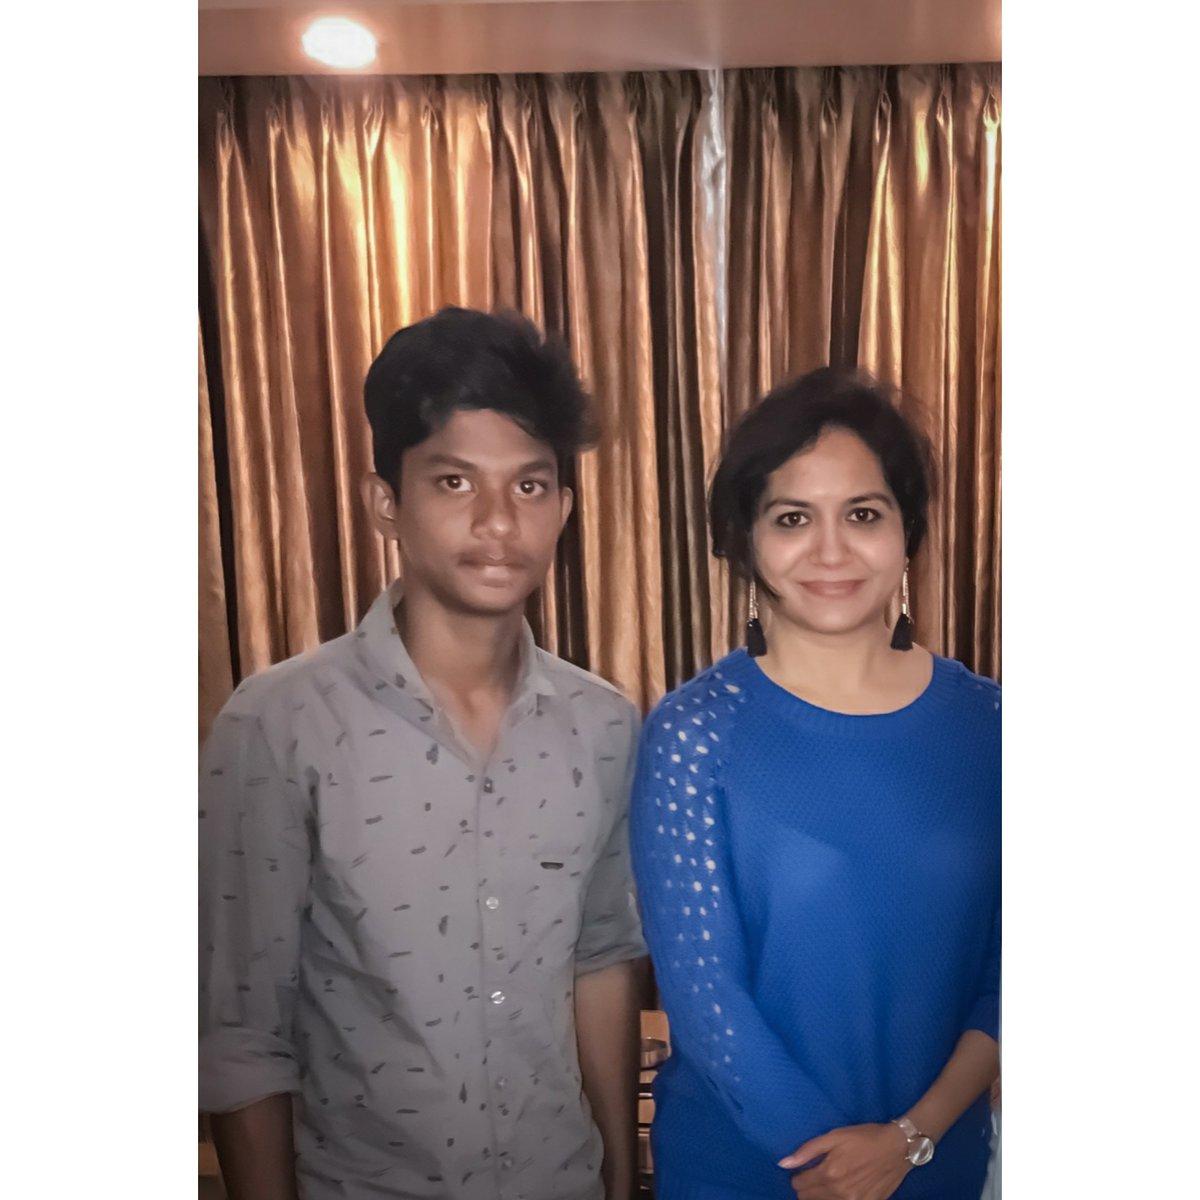 Happy birthday Sunitha ji @OfficialSunitha @sunithaholics #singersunitha #Sunitha #Singer #telugusingers #Tollywoodpic.twitter.com/KldIfRut4j